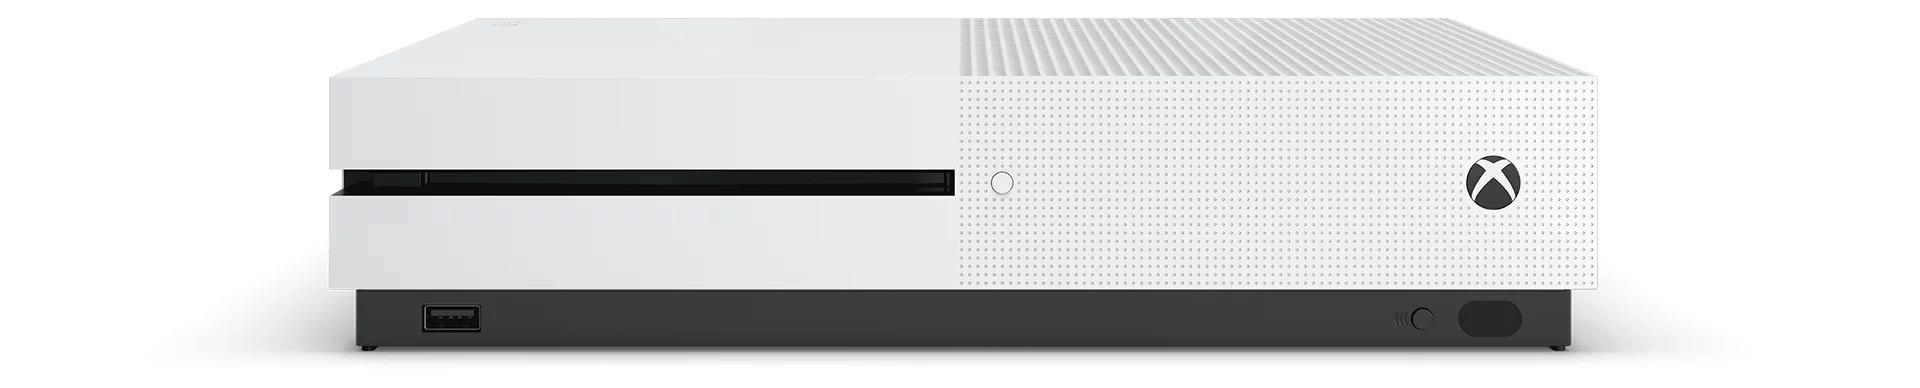 Microsoft presentó la nueva Xbox One S